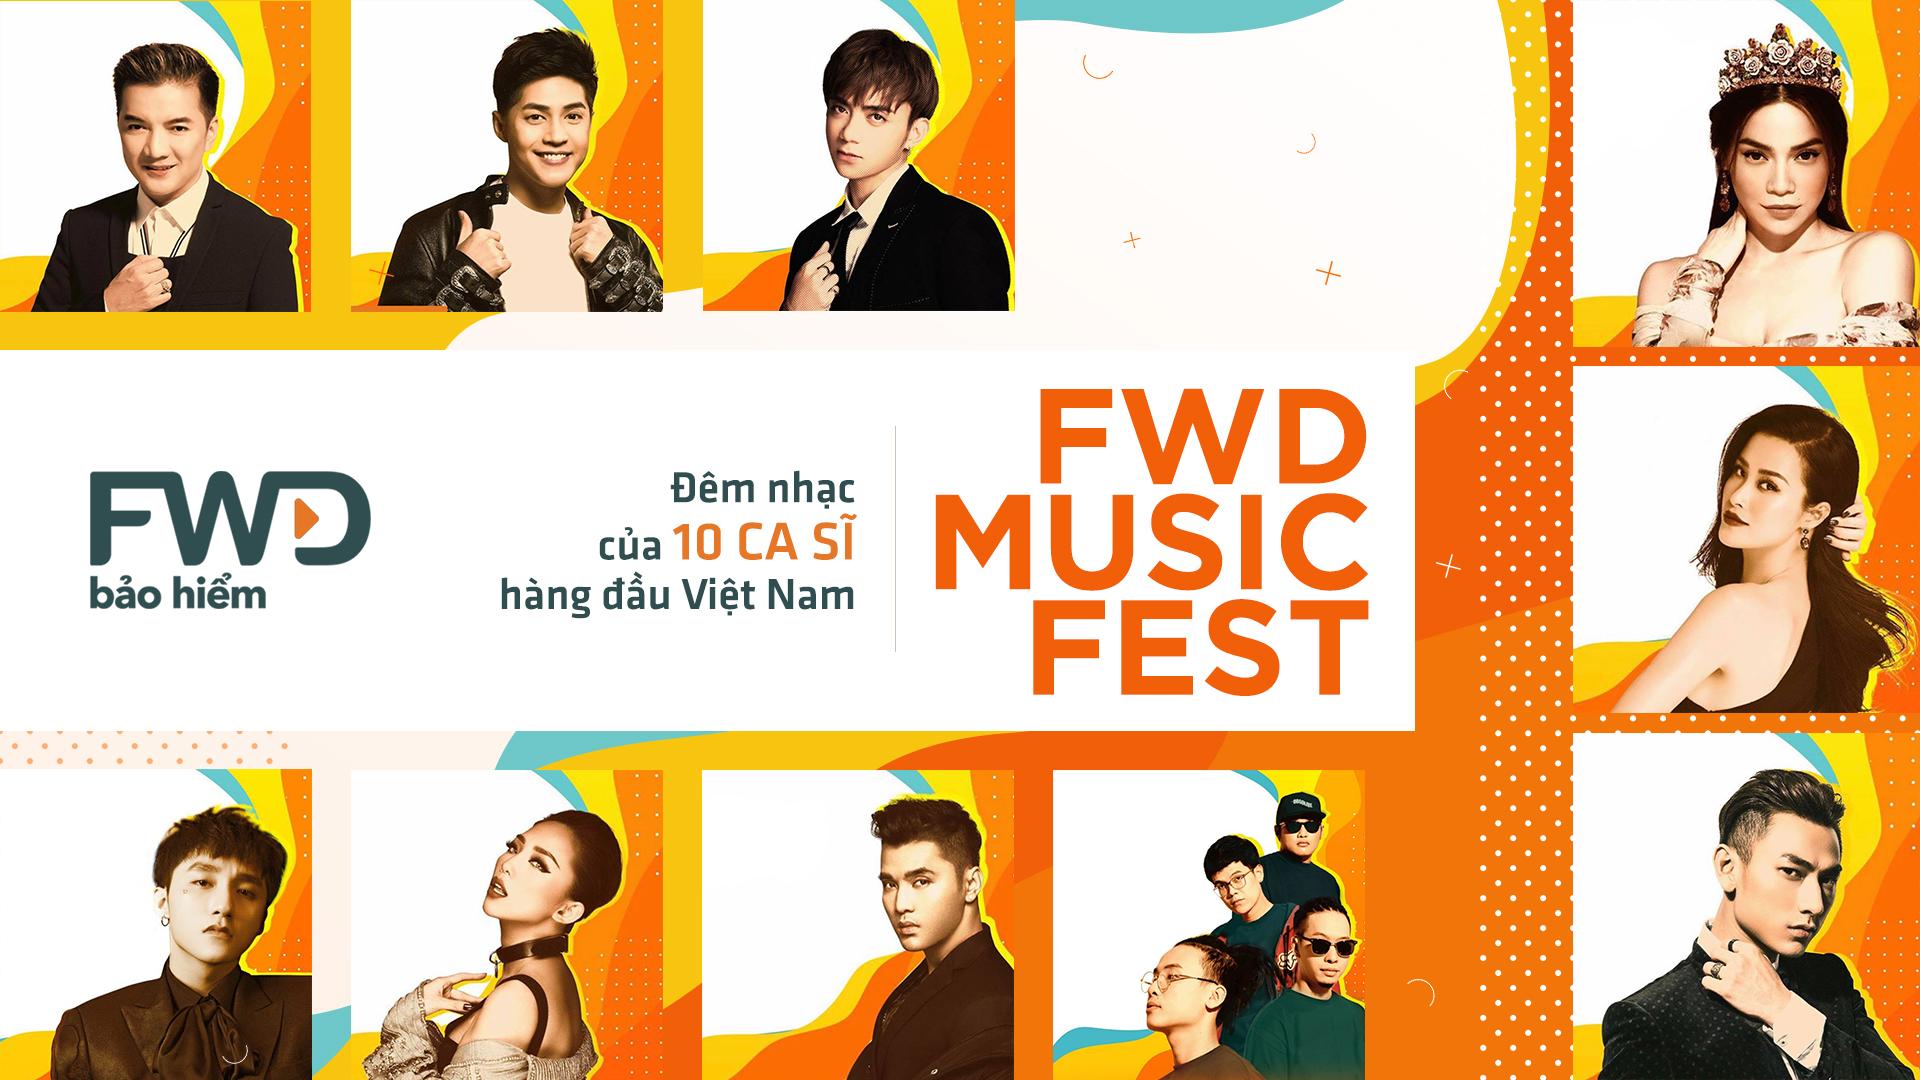 Lễ hội Âm nhạc FWD Music Fest